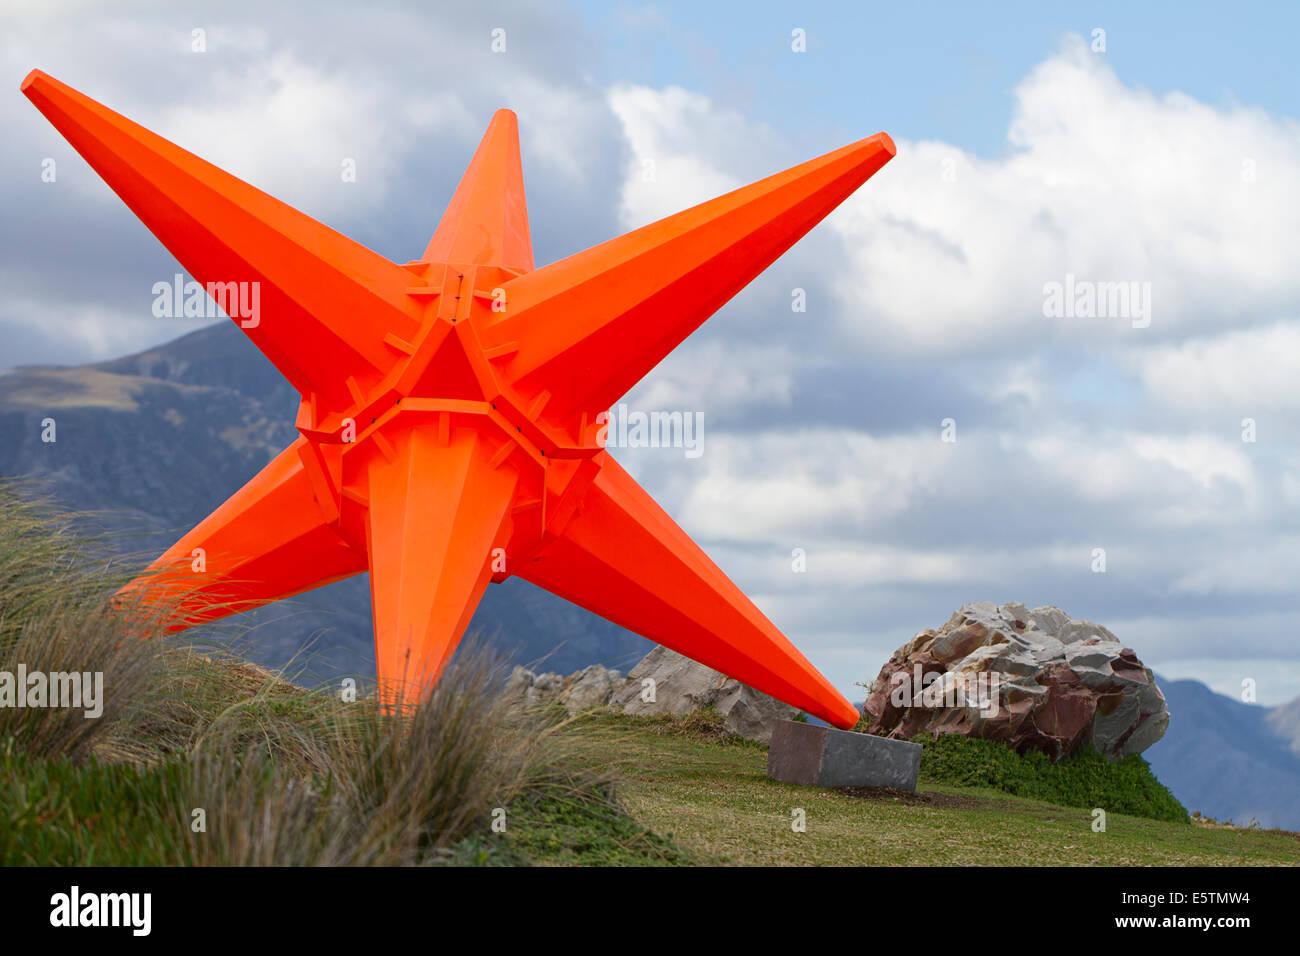 Weird modern sculpture of giant traffic cones - Stock Image